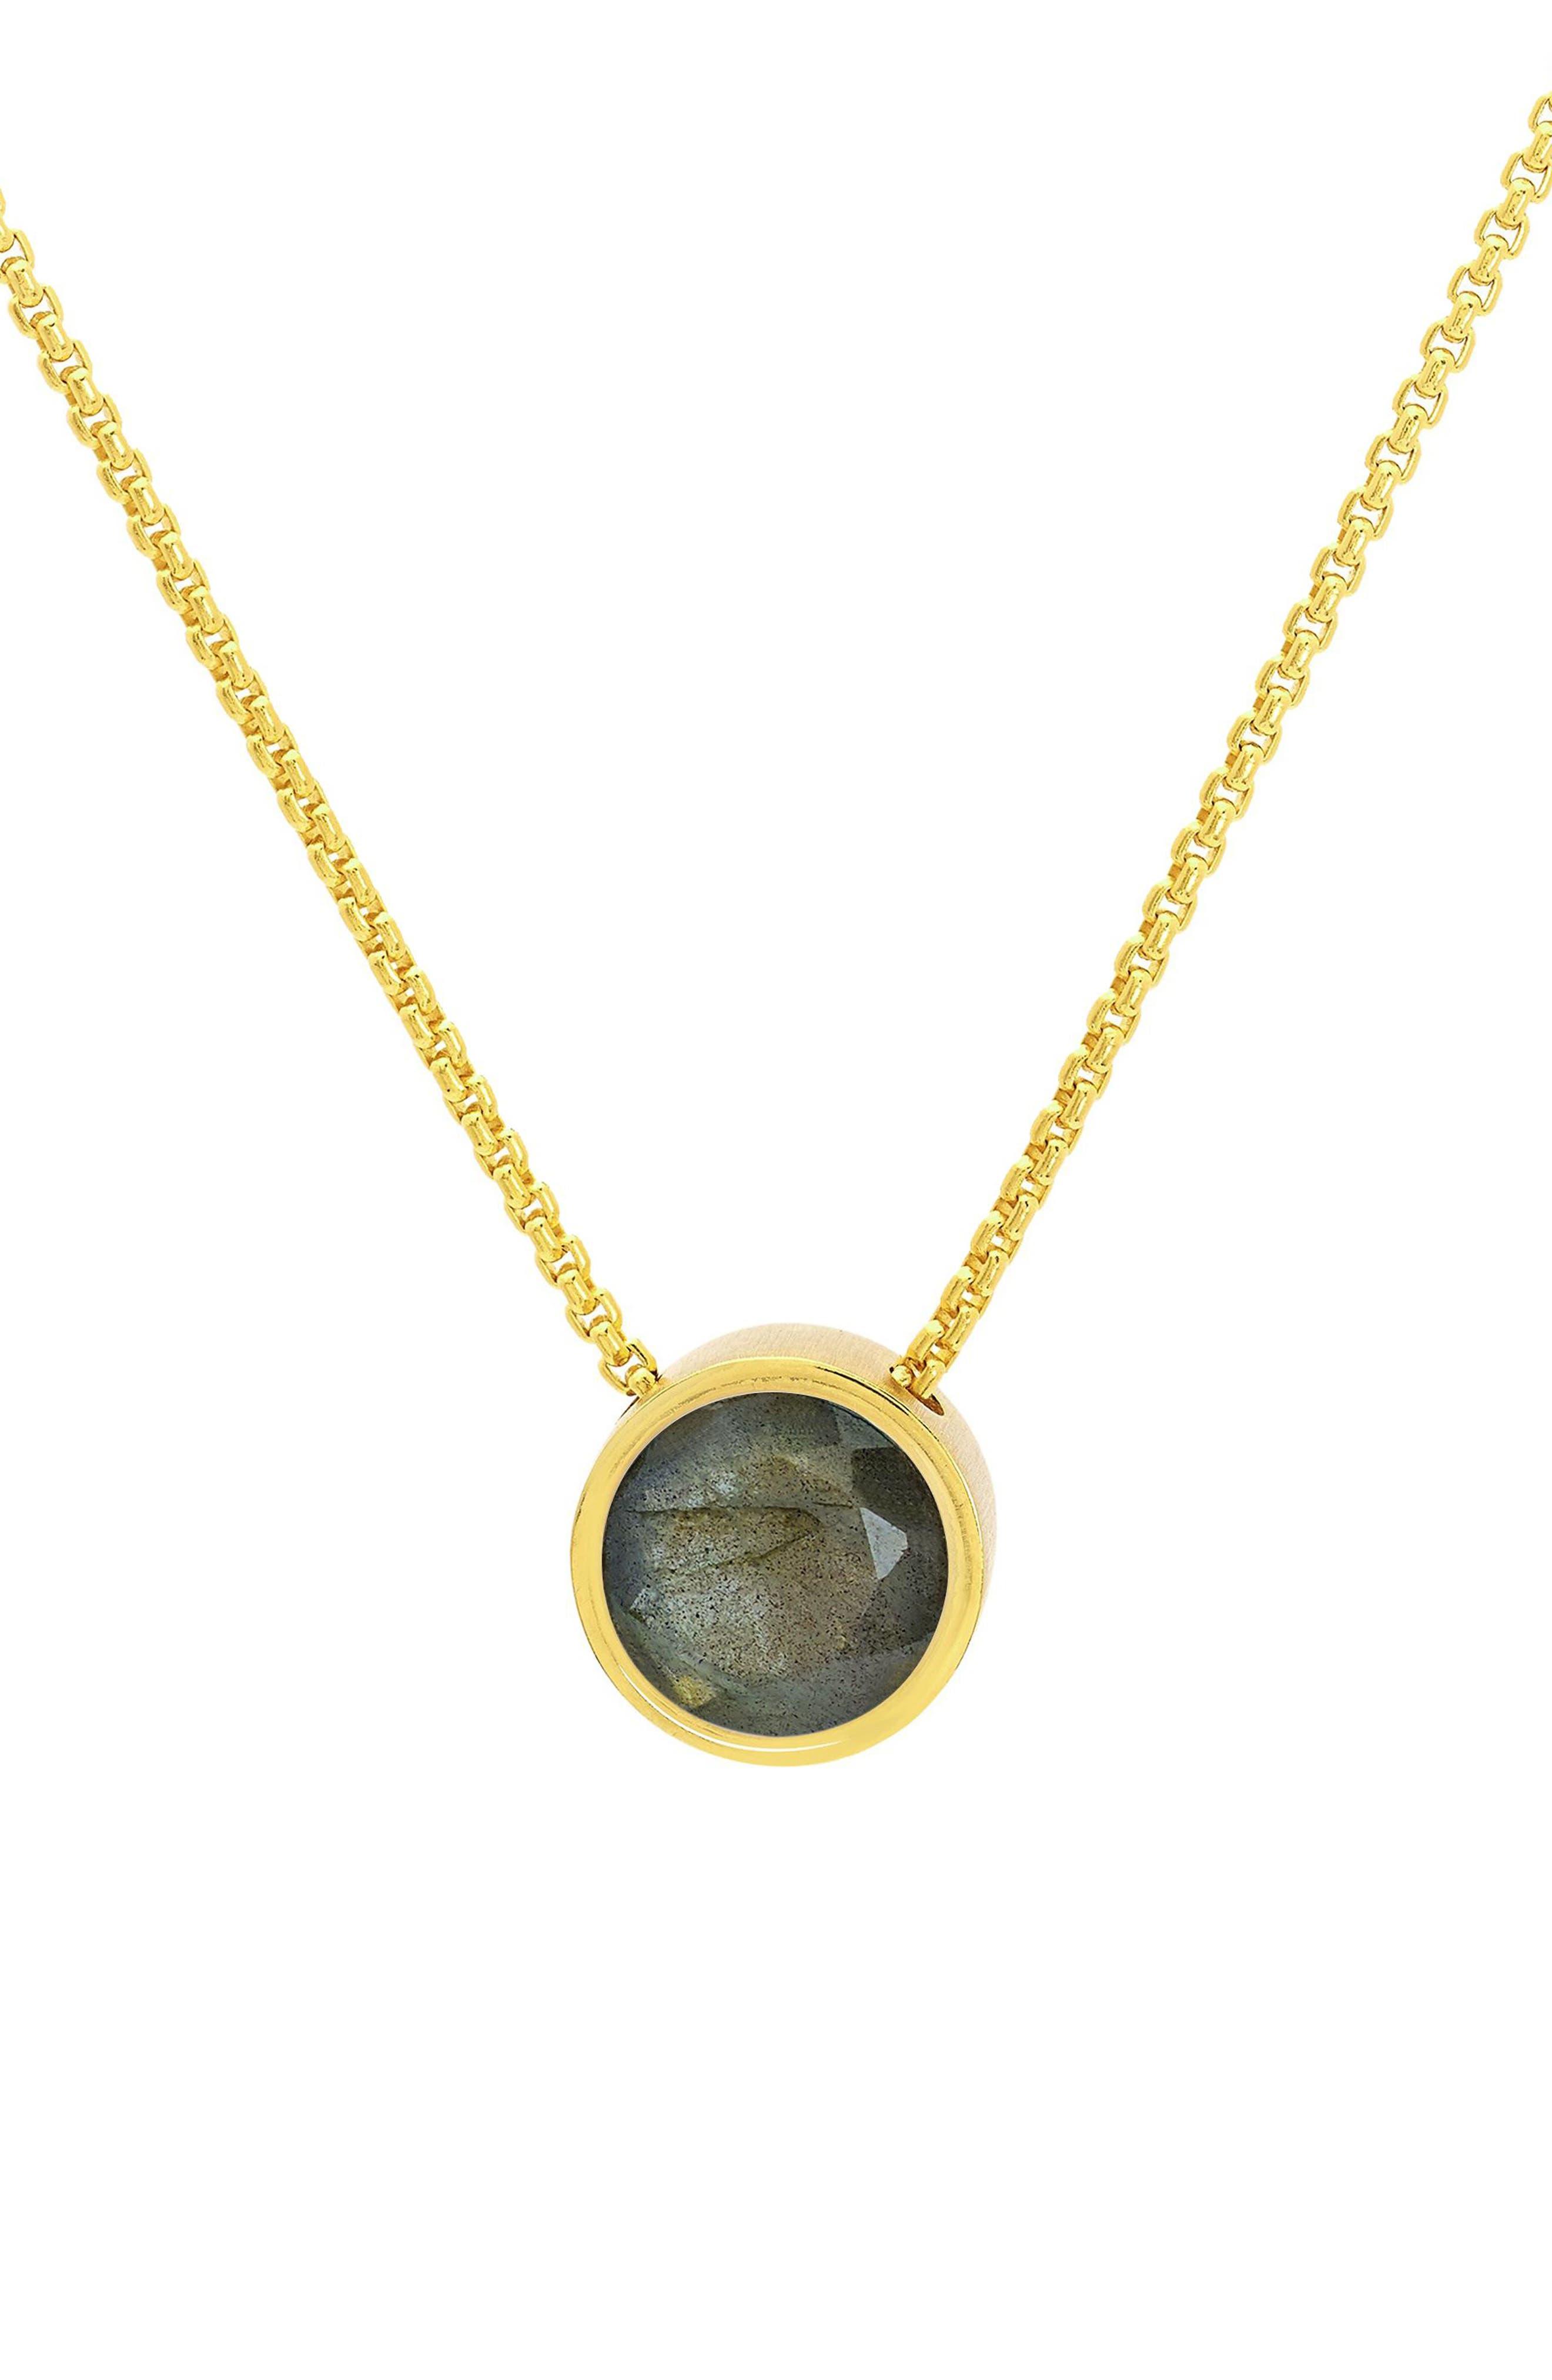 Midi Signature Labradorite Pendant Necklace